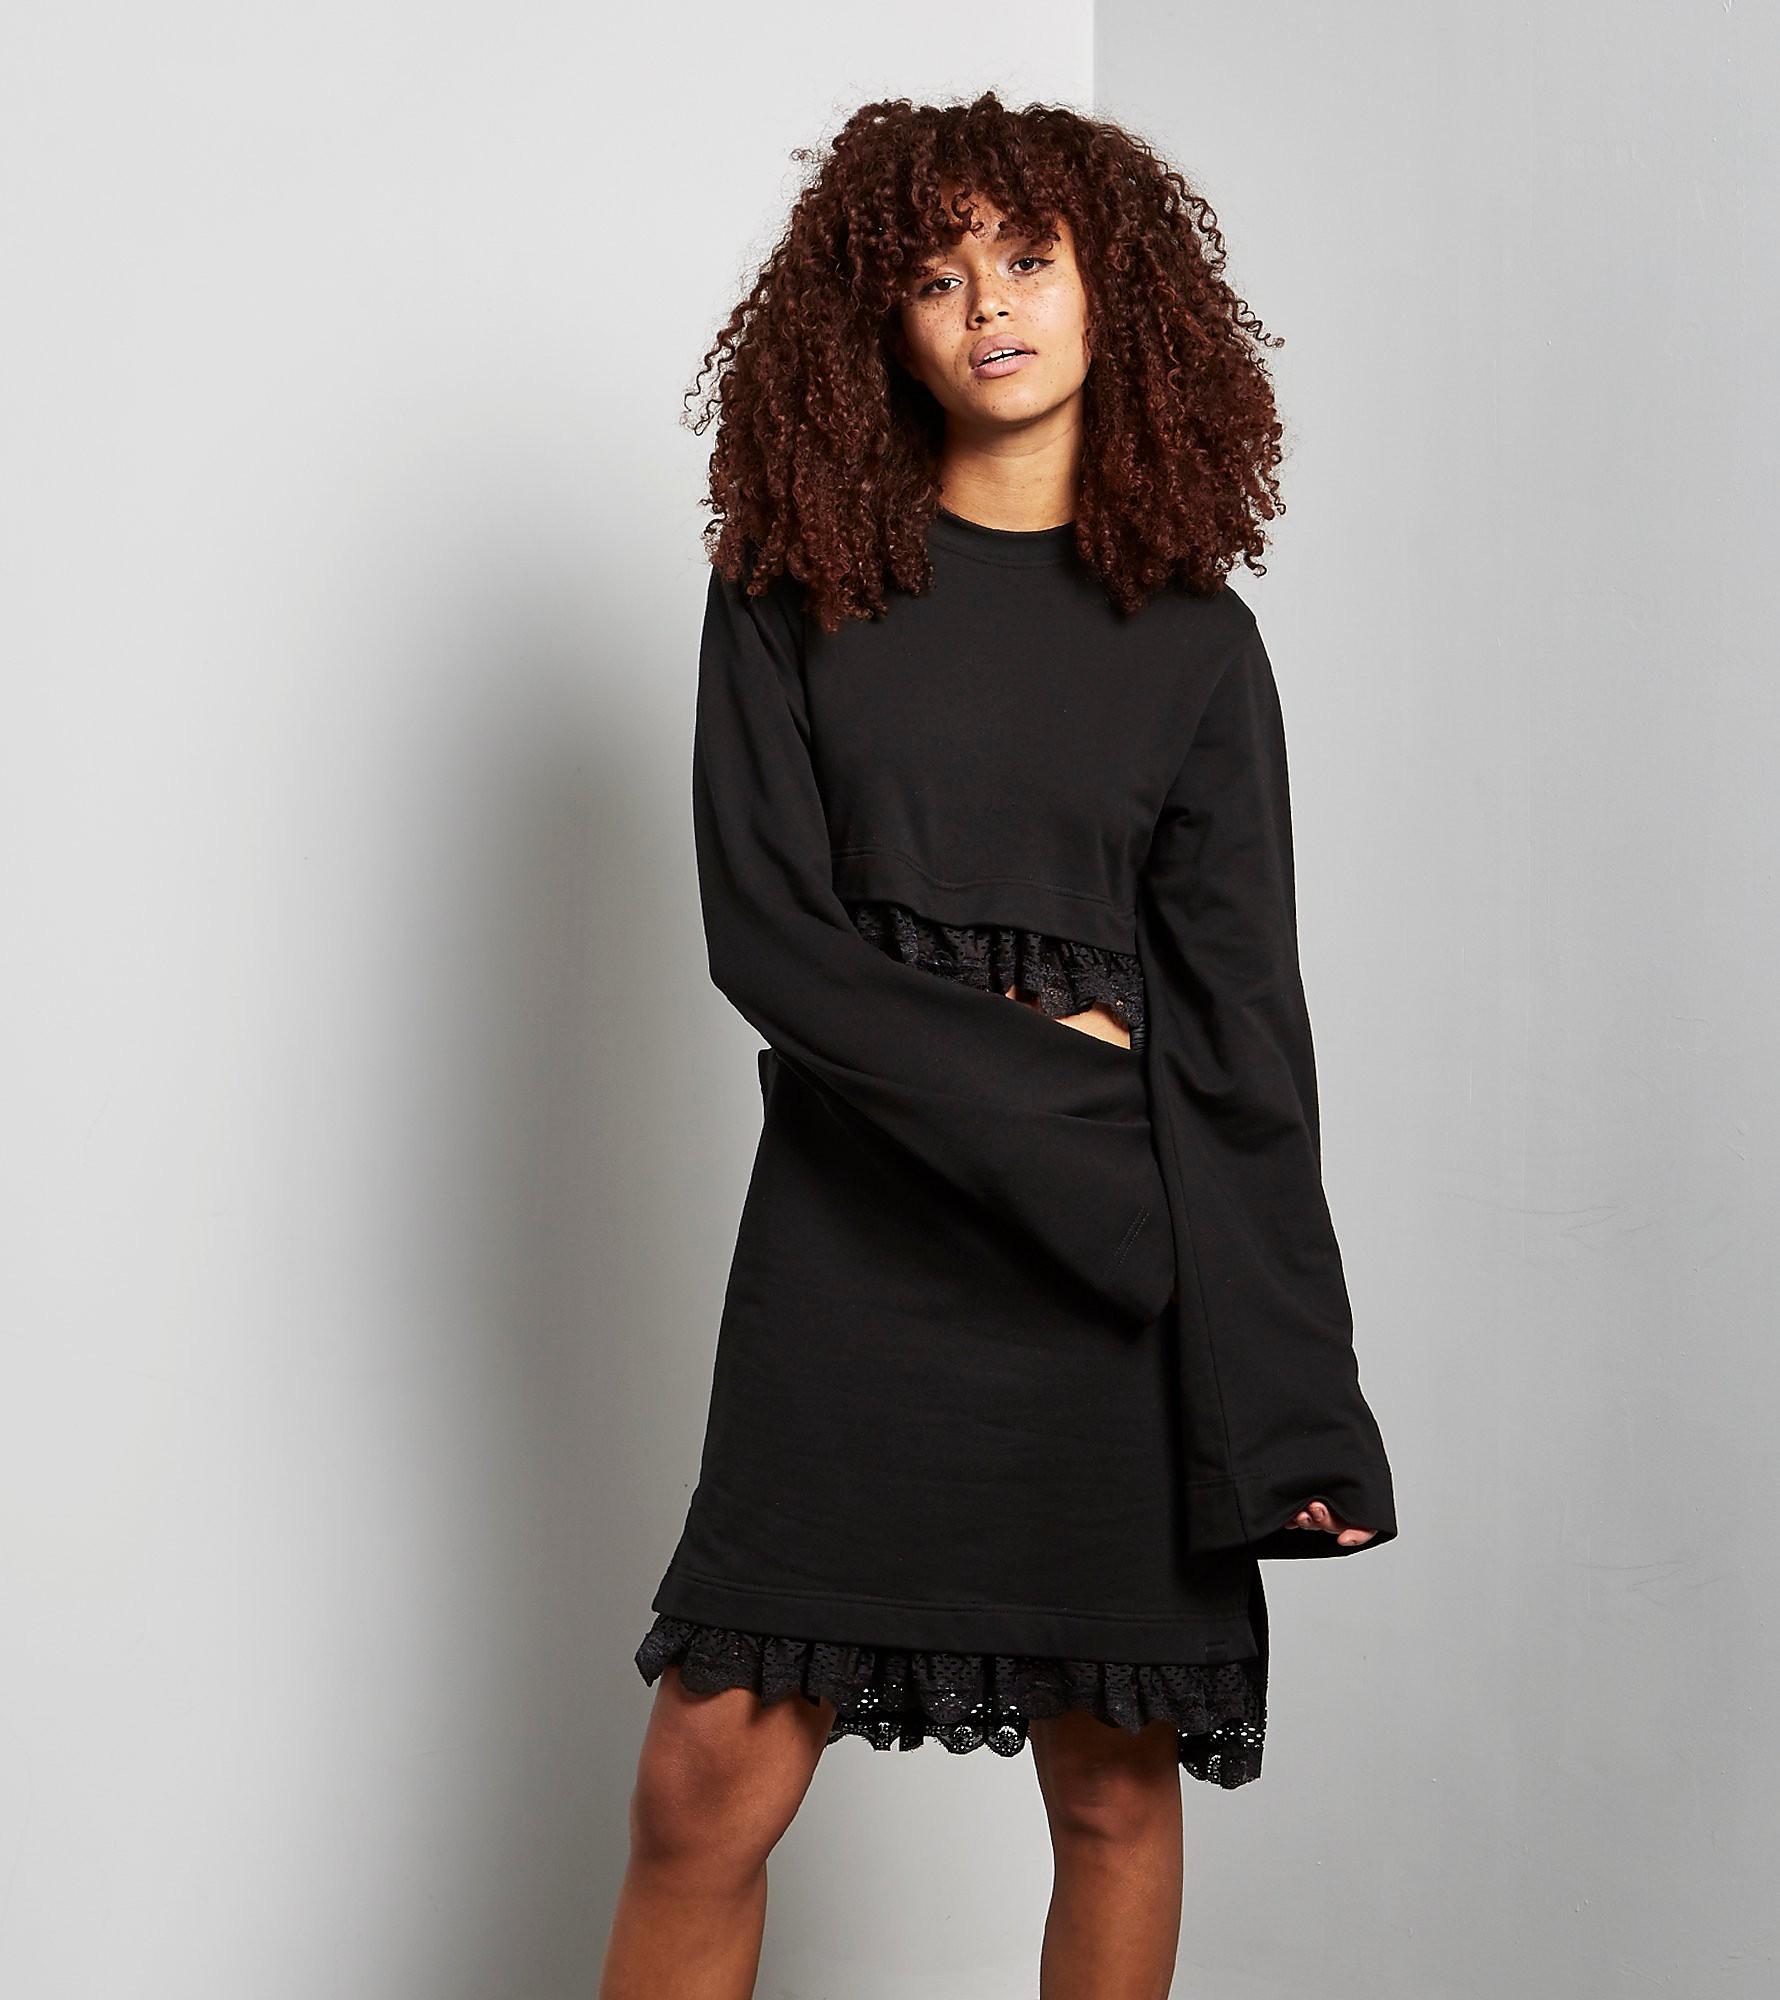 PUMA x Fenty Suspender Dress